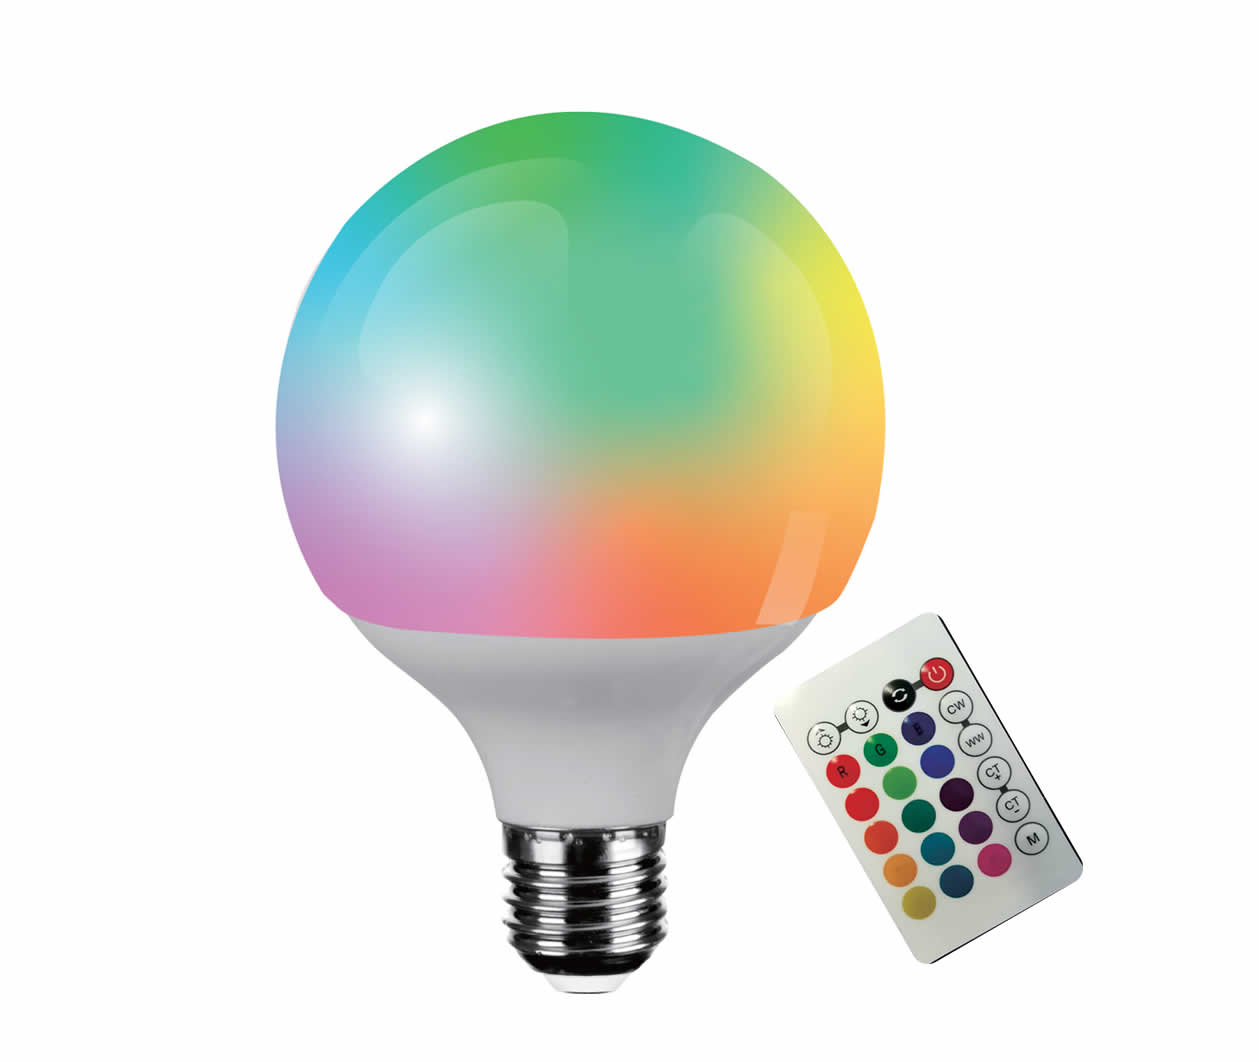 G95 11W LED Smart Wifi E27 Bulb + Remote